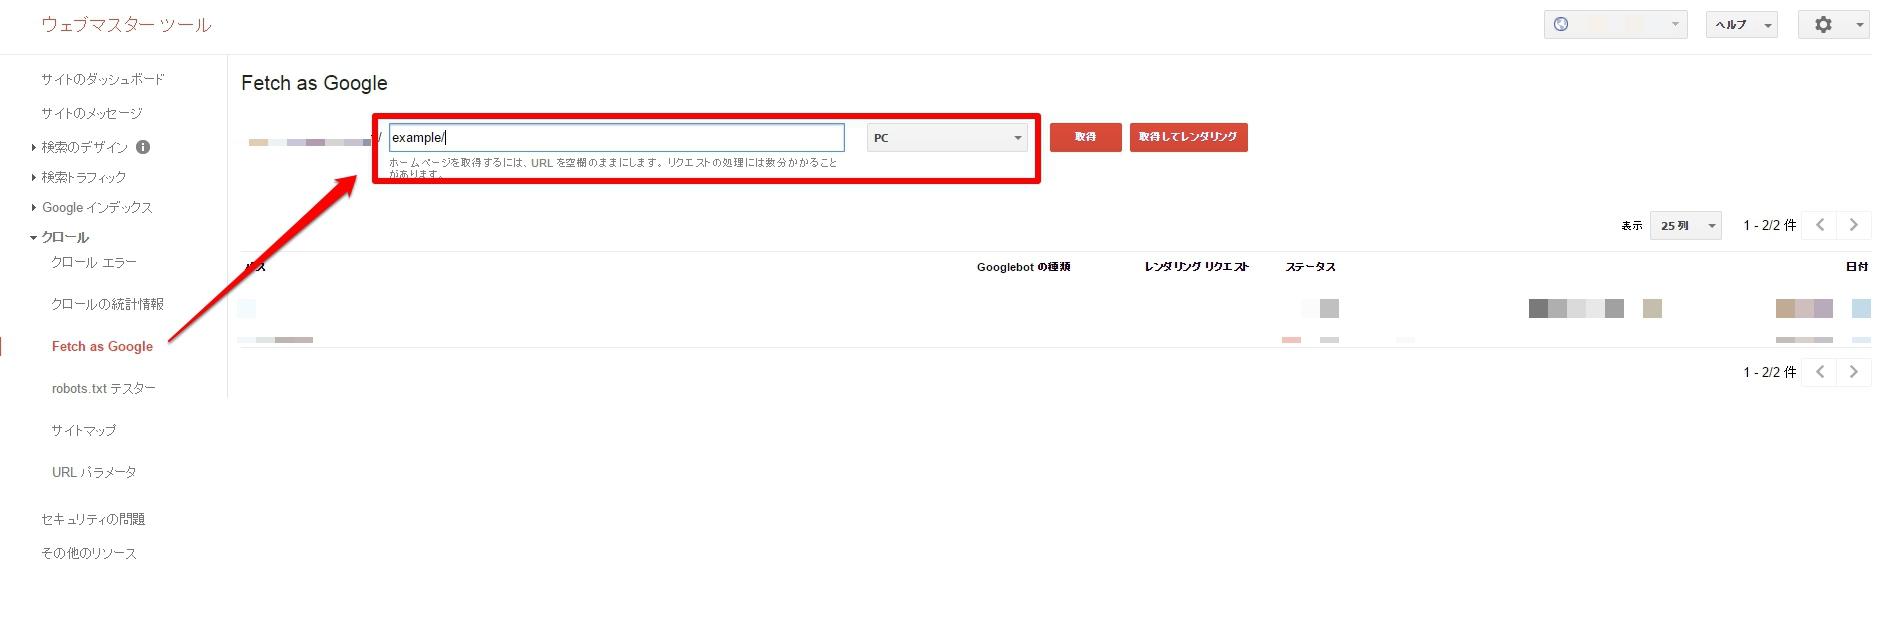 Fetch as Google画面